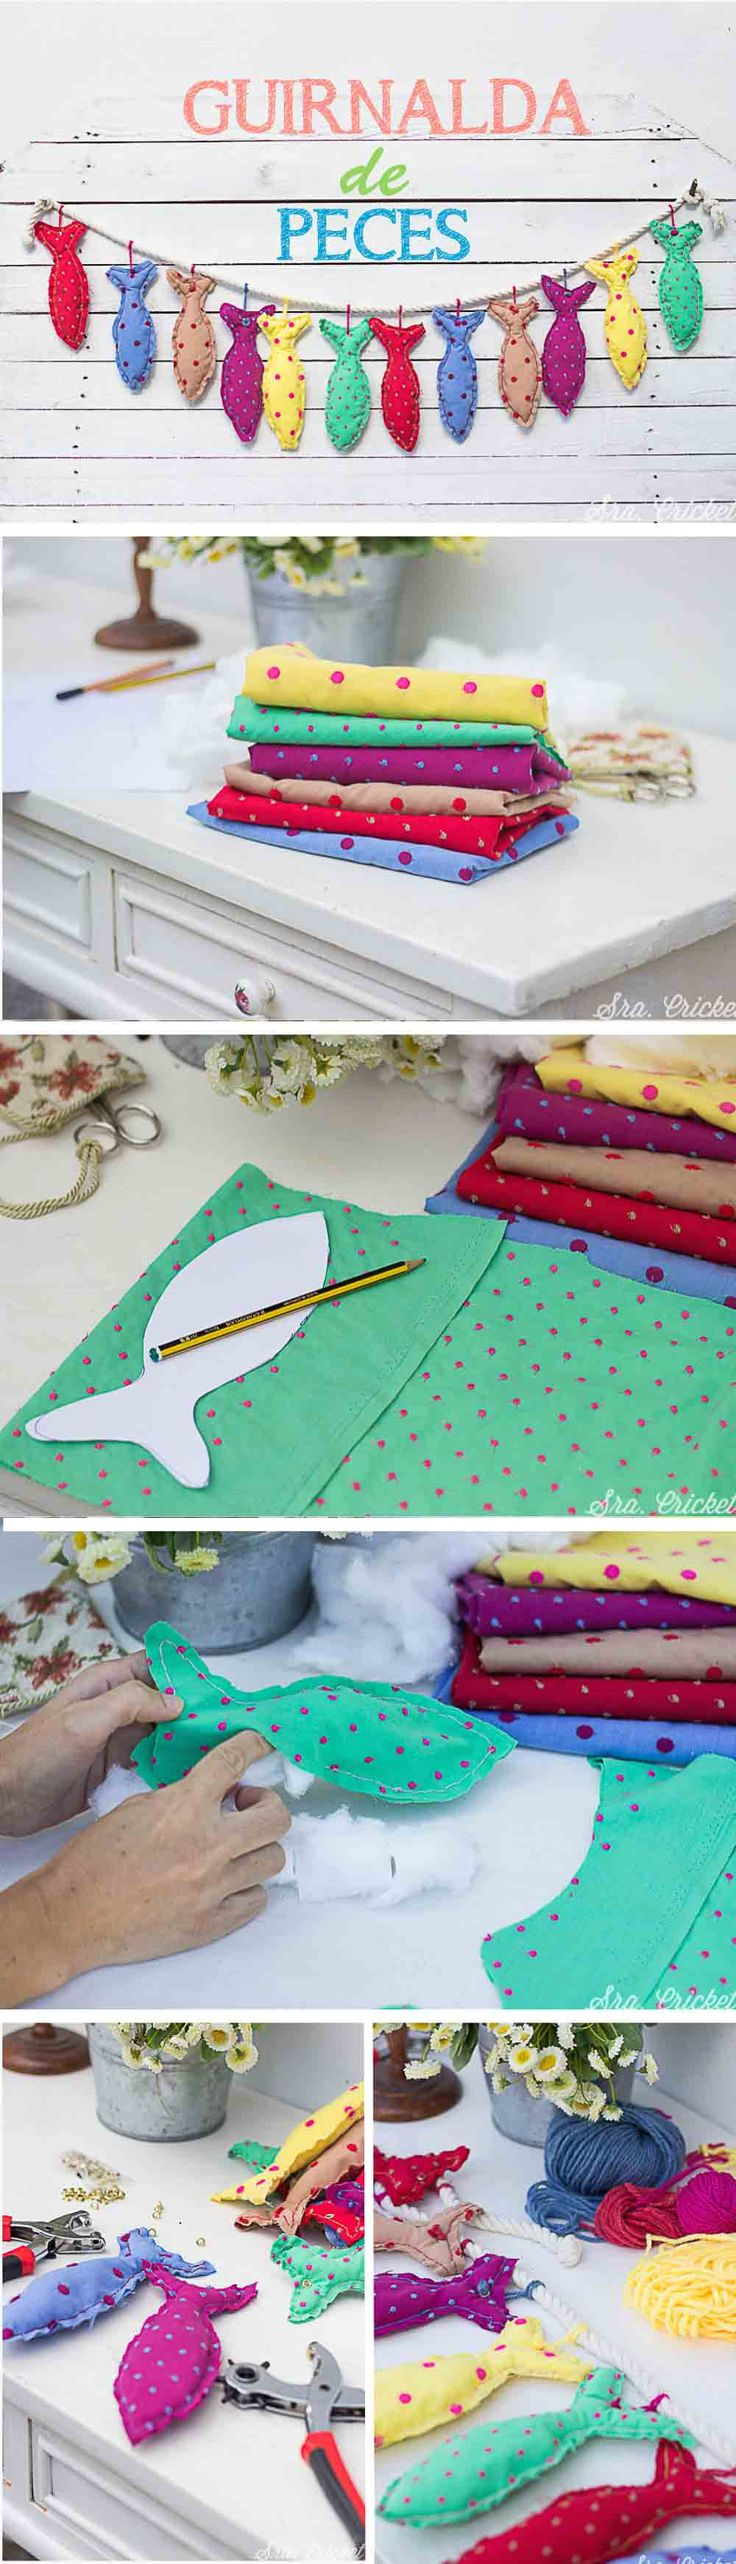 Guirnalda de peces de tela #cojinesdepeces #pecesdetela #fabriccrafts #garland #kidsgarland #kidsdecoration